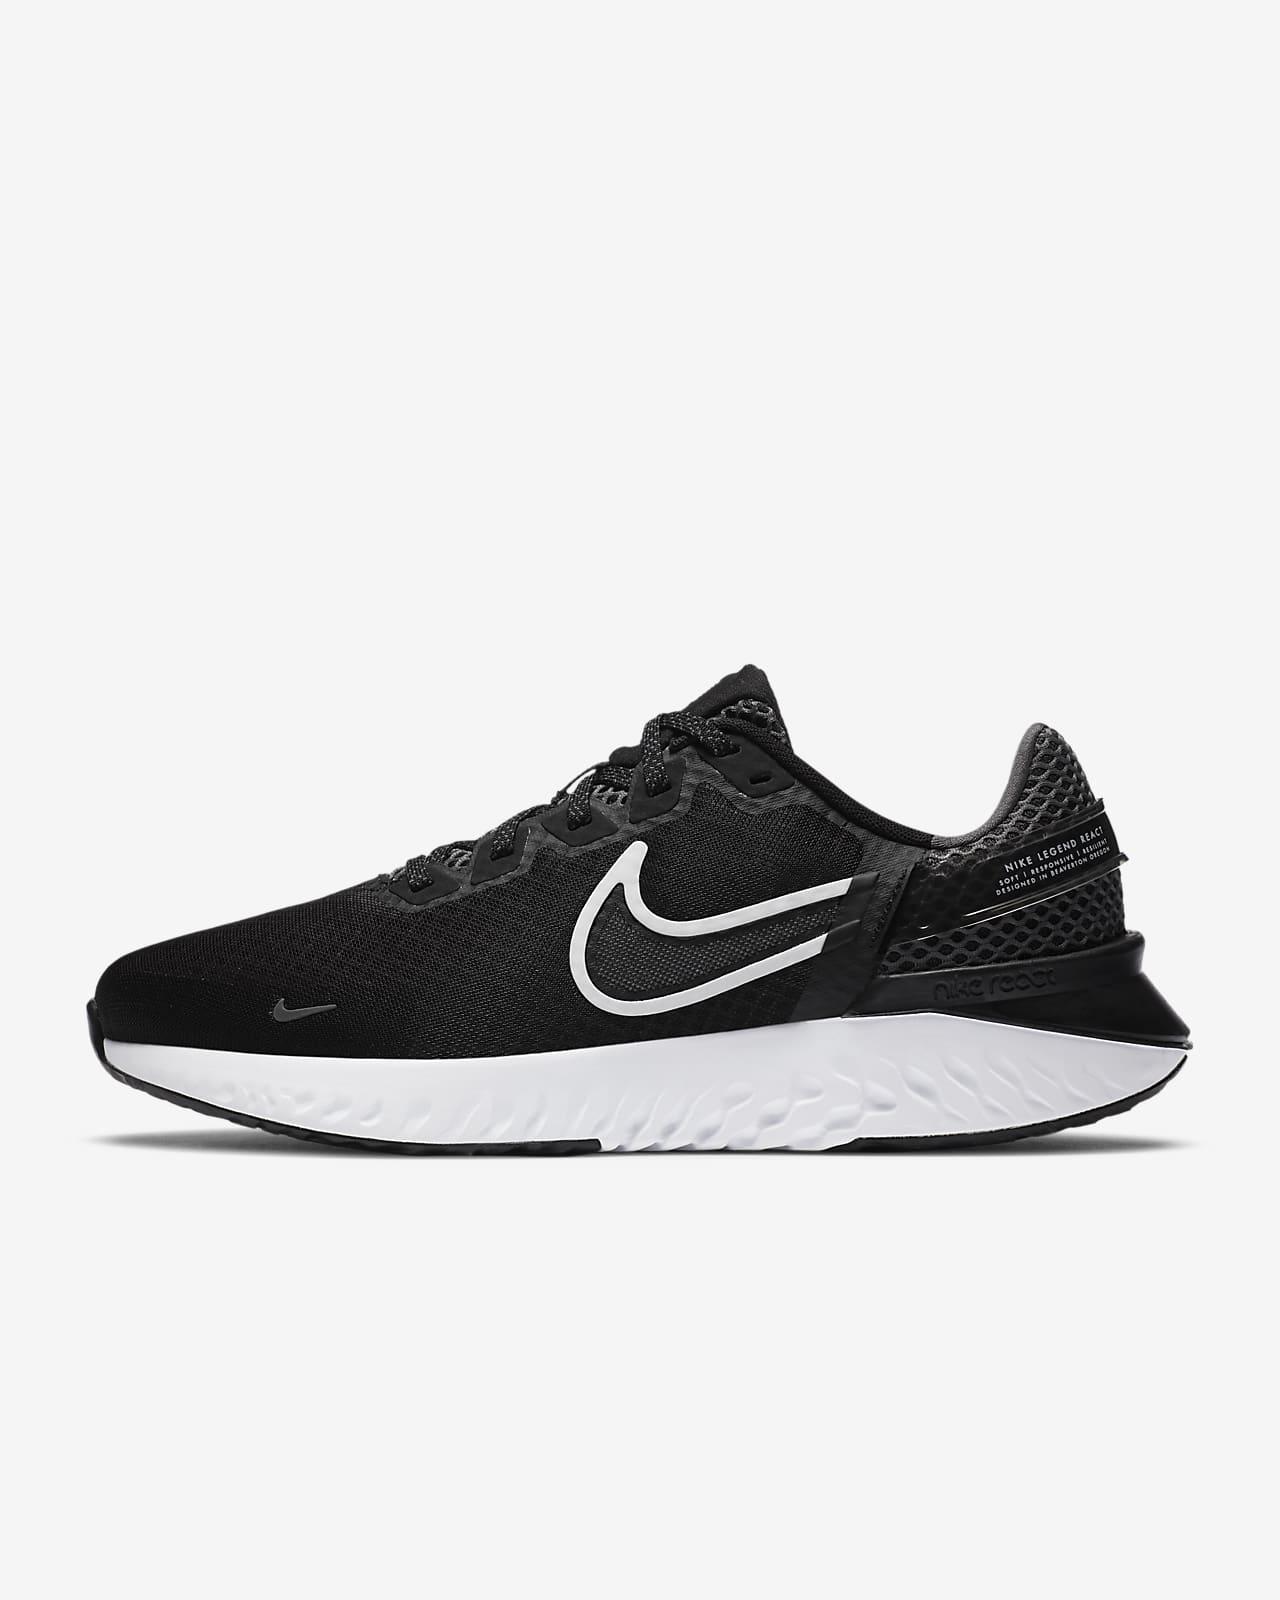 Nike Legend React 3 Men's Road Running Shoes